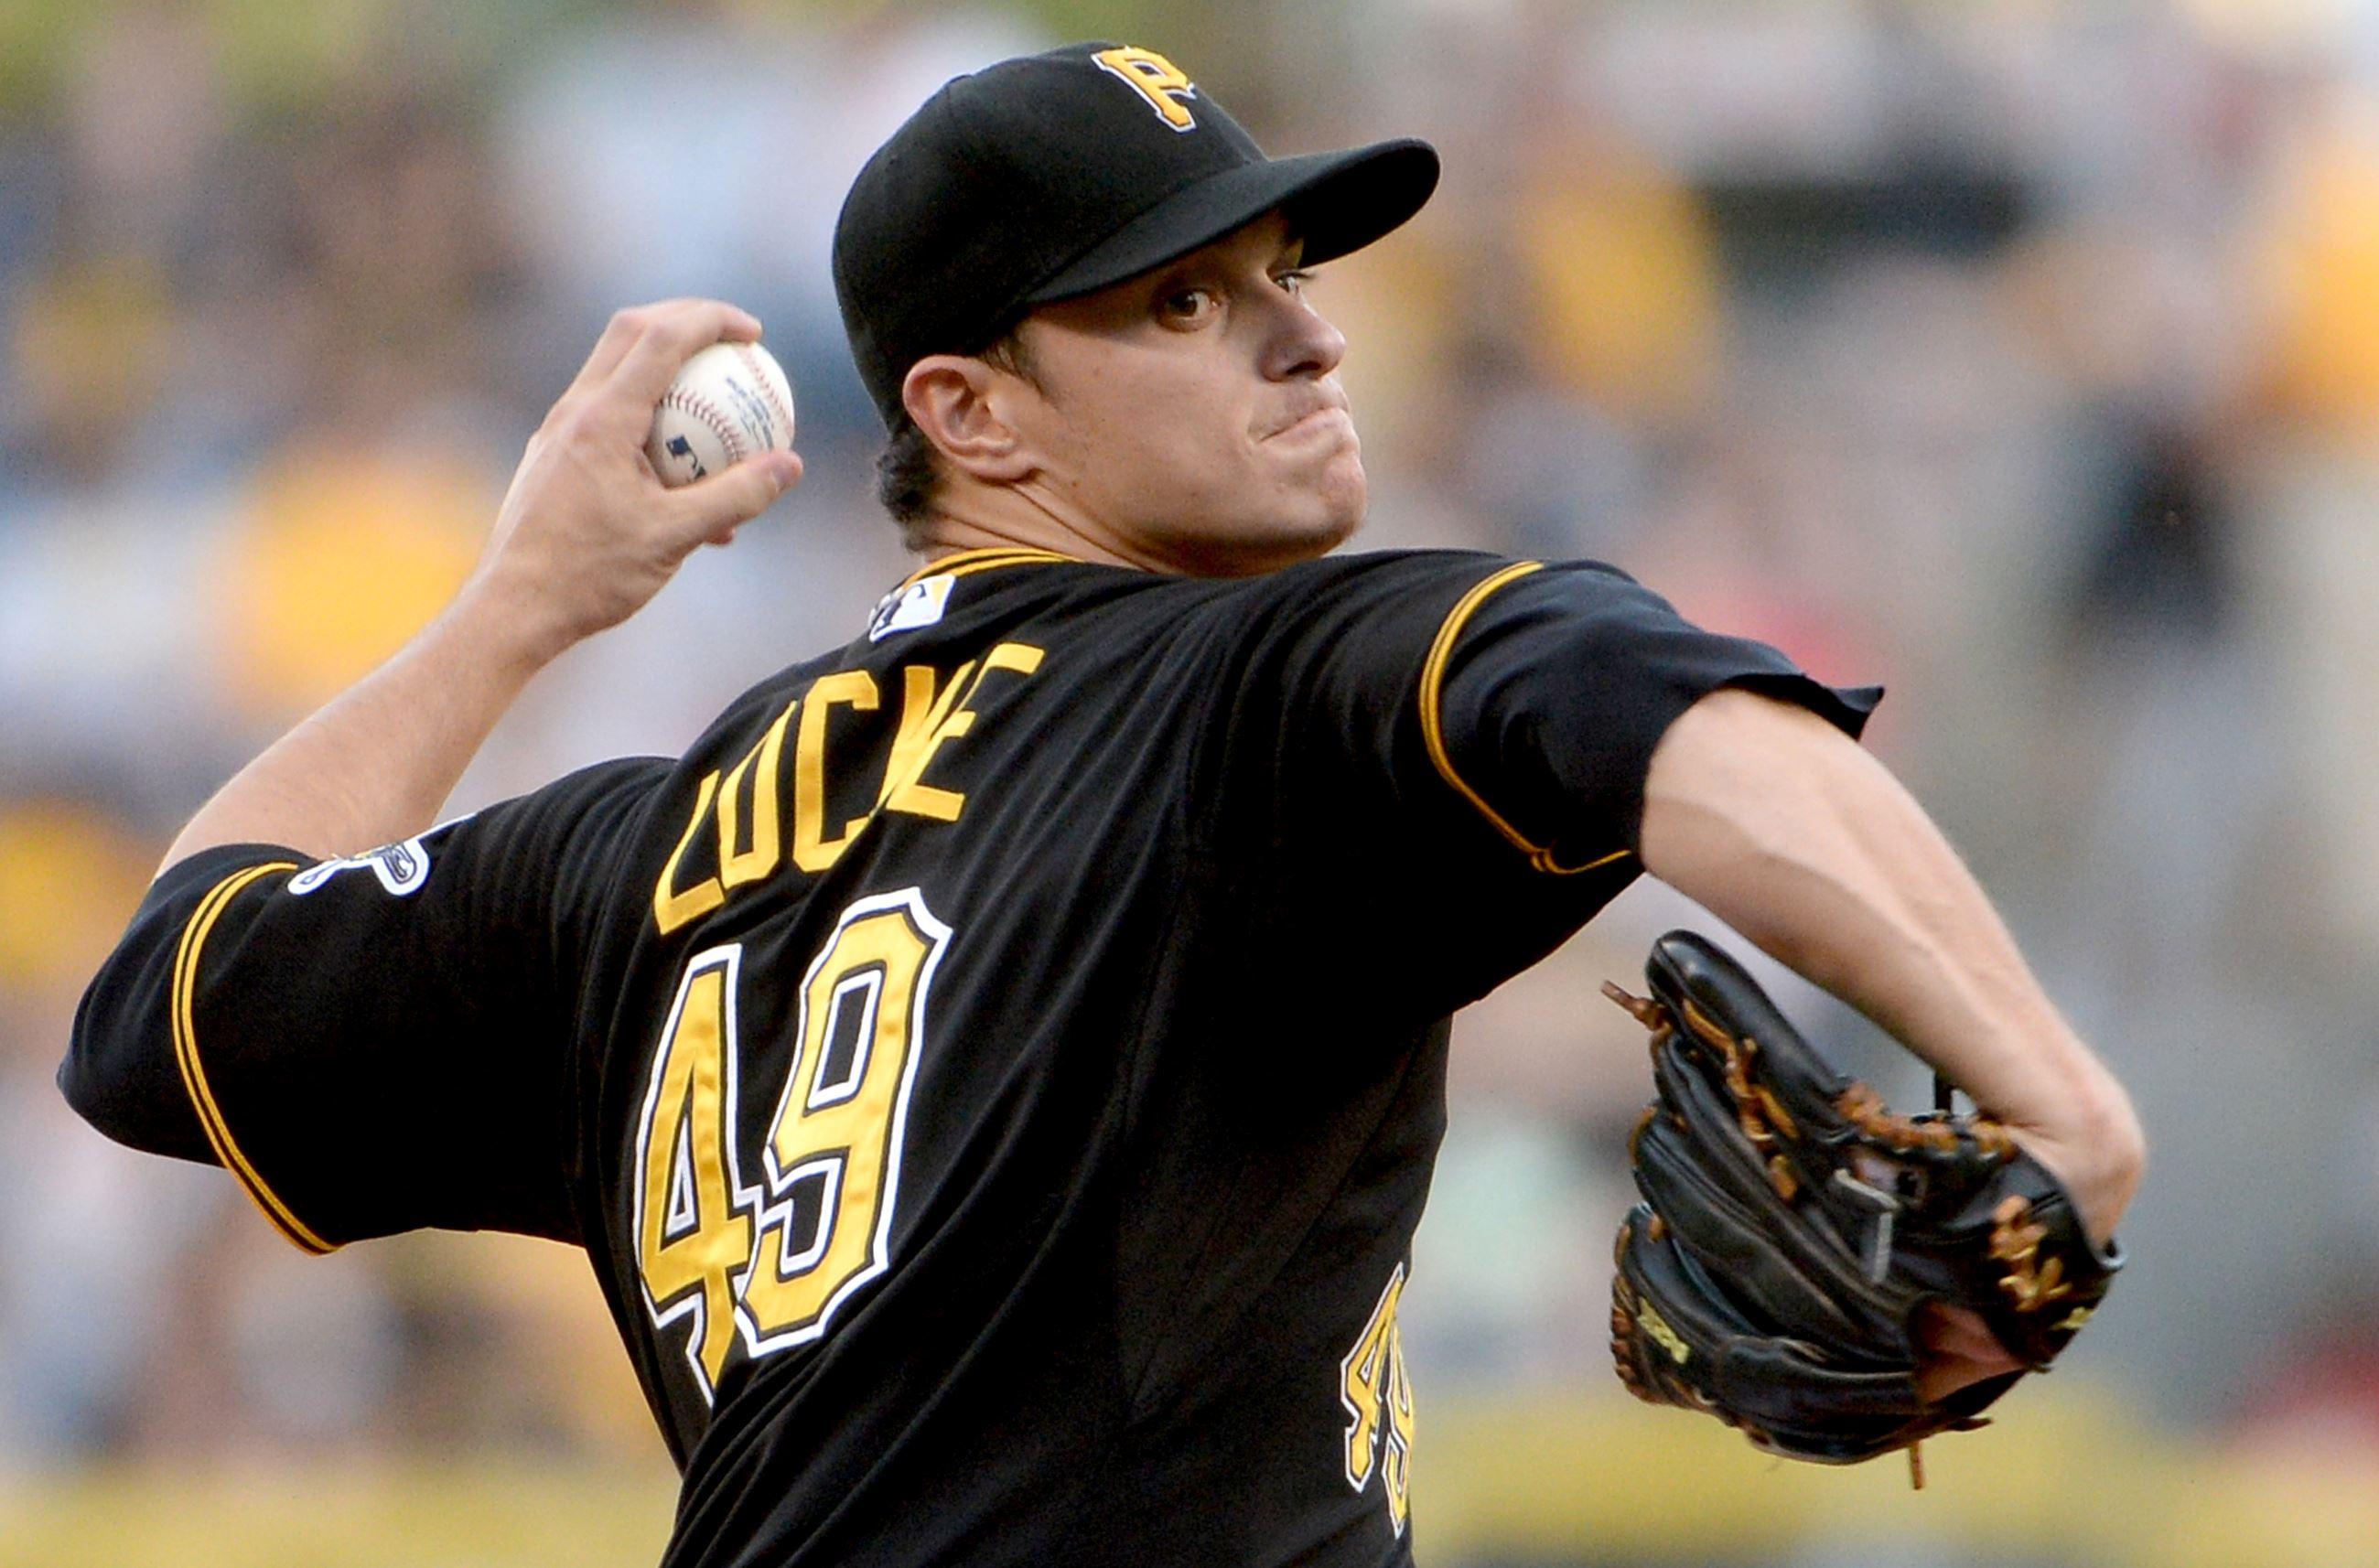 Report: Pirates, Jeff Locke avoid arbitration